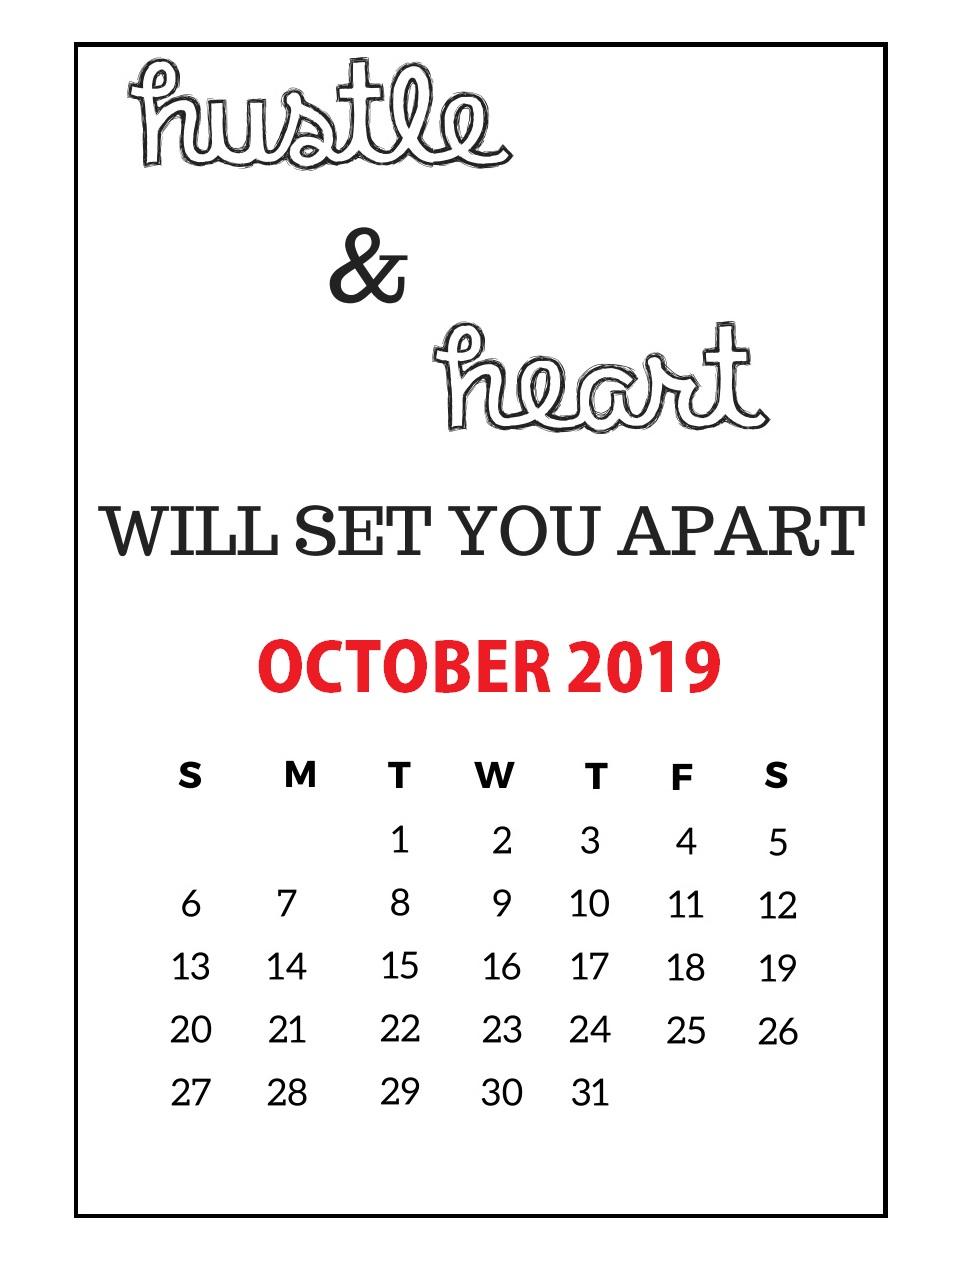 Inspiring October 2019 Quotes Wall Calendar